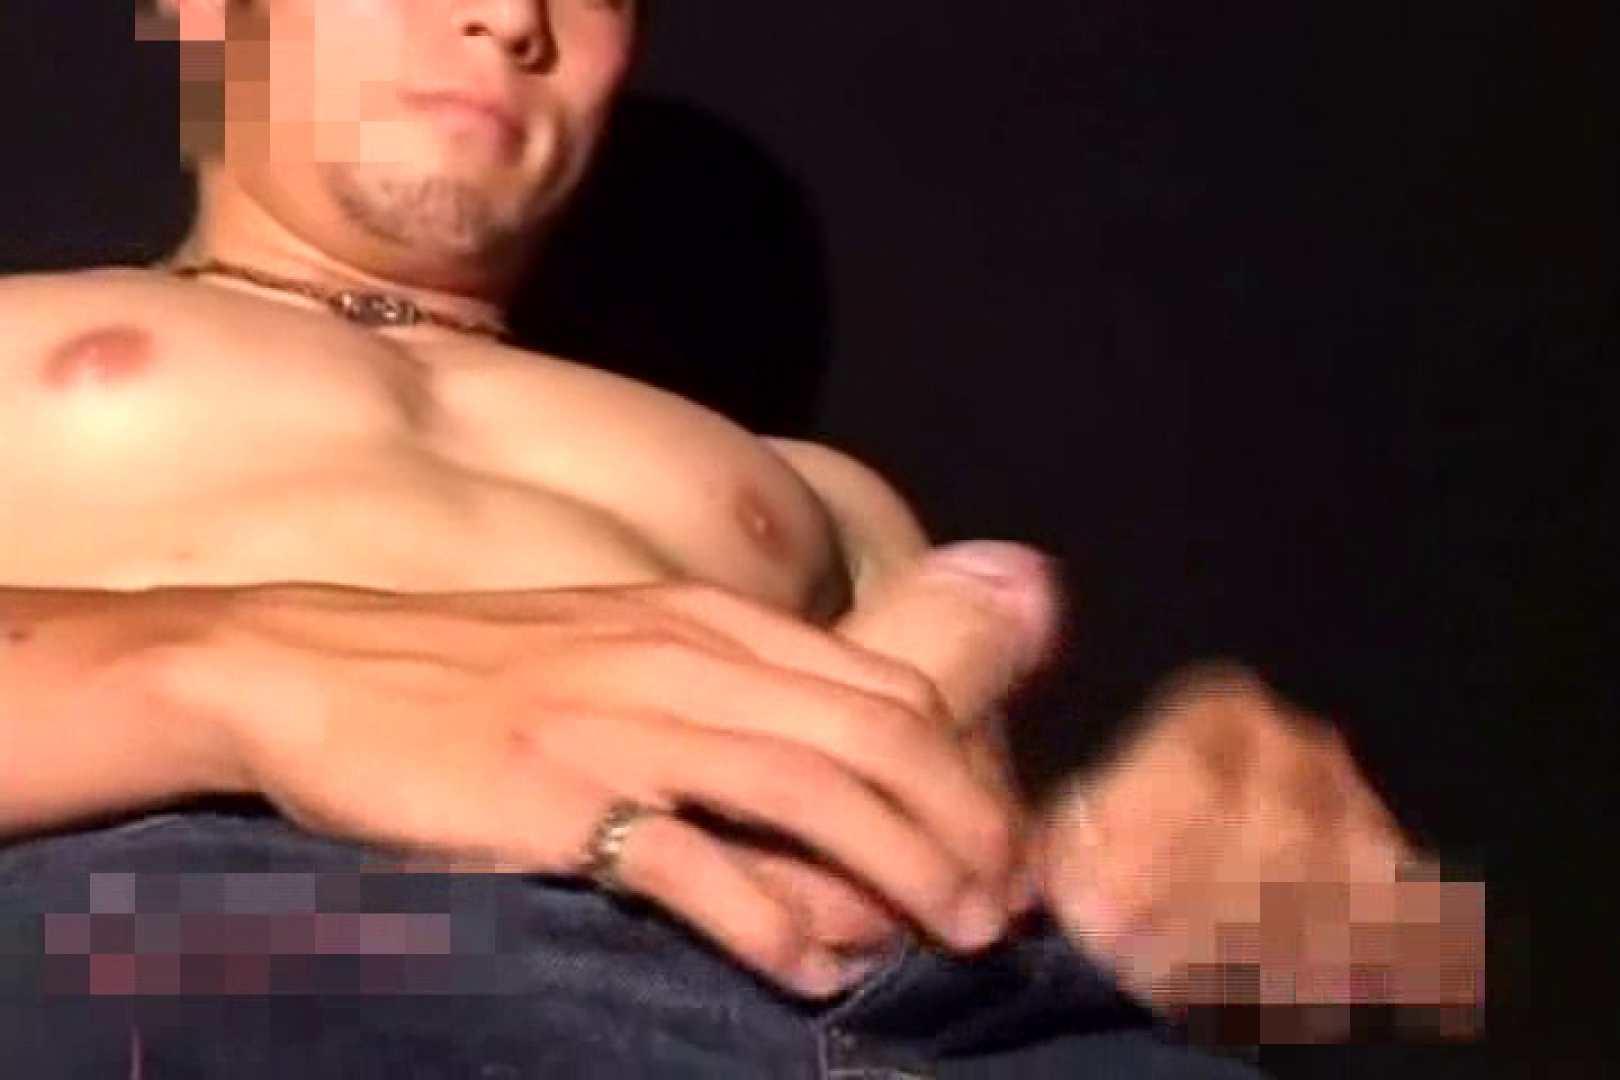 Beautiful muscle モッコリ野郎達!Vol.04 プレイ ゲイ無修正ビデオ画像 49連発 16